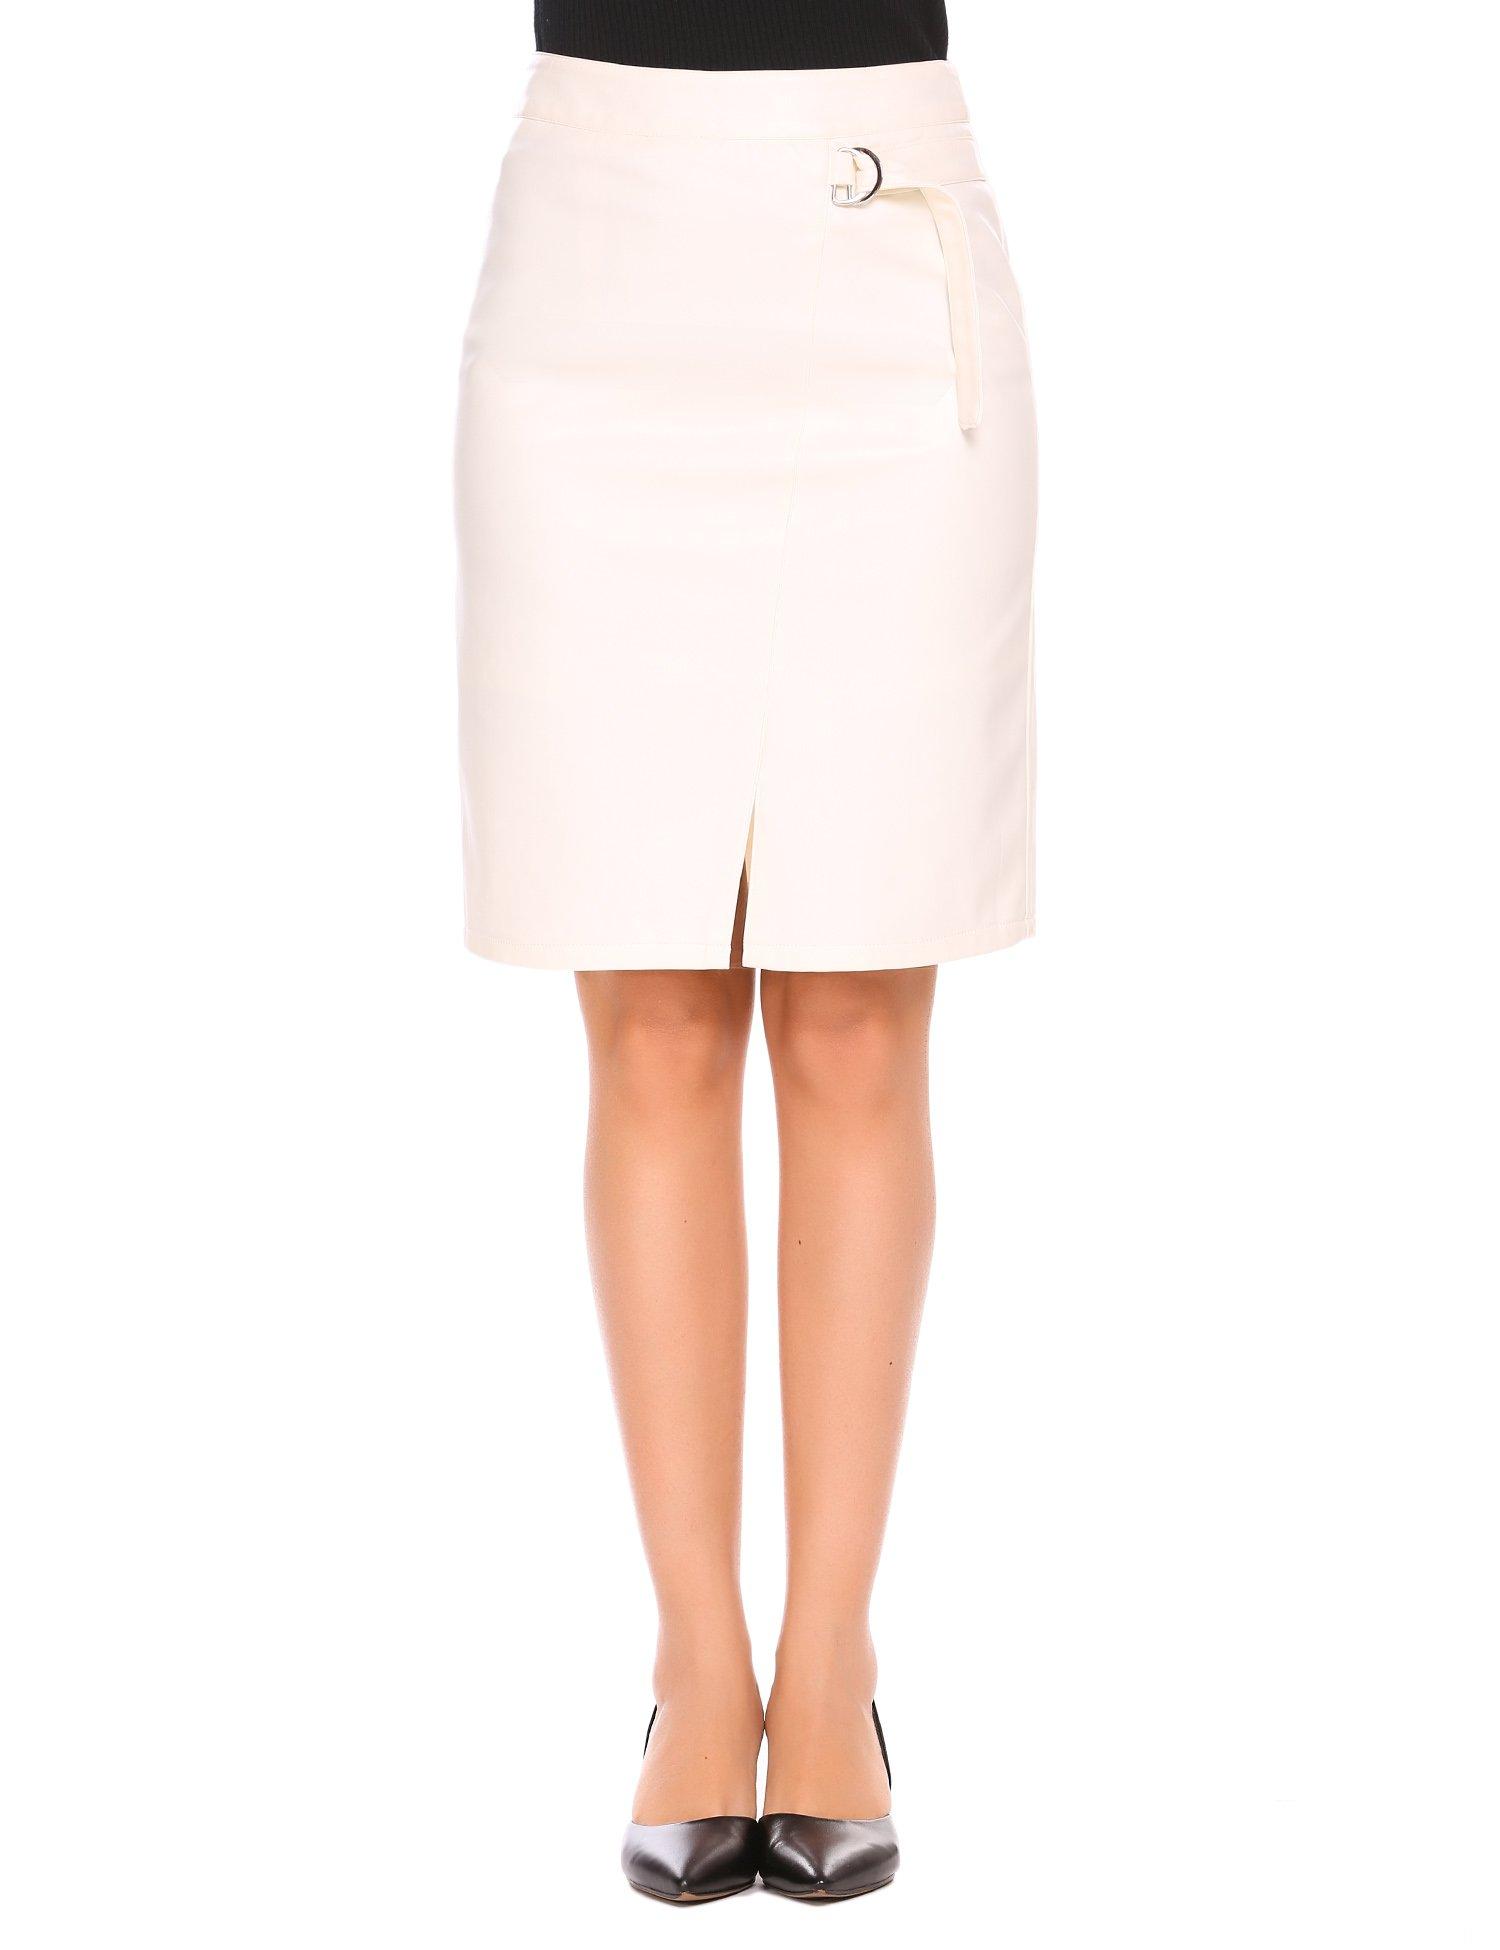 Shine Women's PU Leather Skirt High Waist Knee Length Slim Pencil Skirts S-XXL